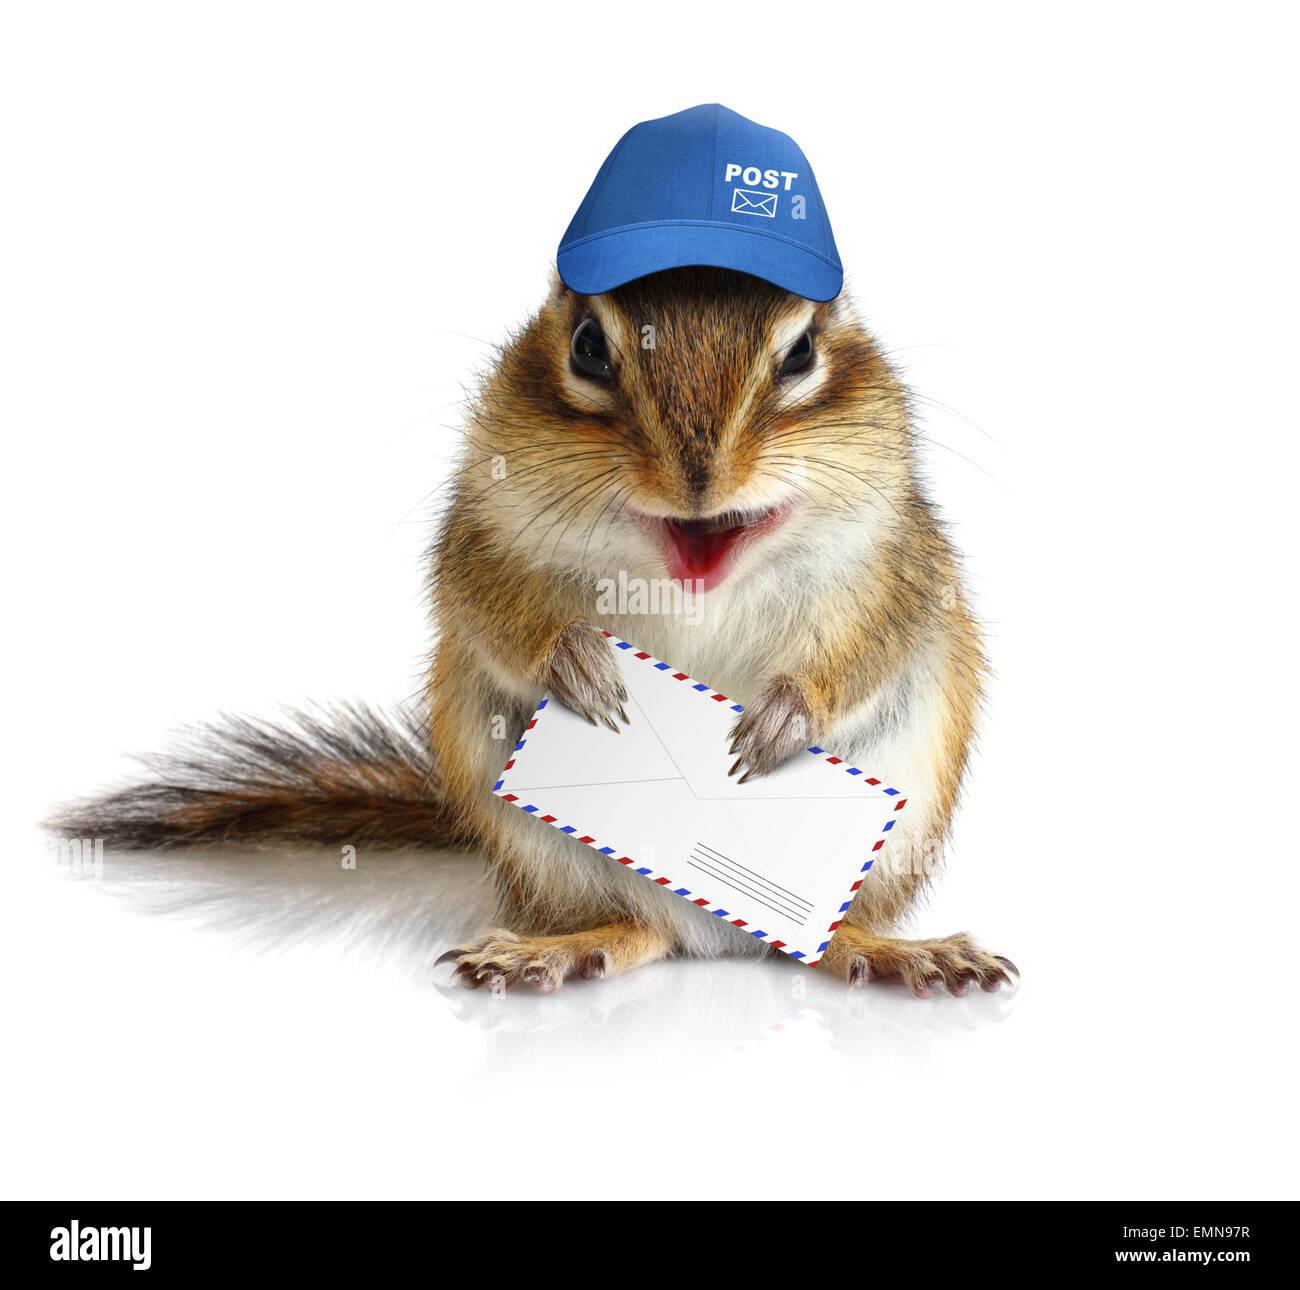 comical chipmunk postman hold mail envelope - Stock Image